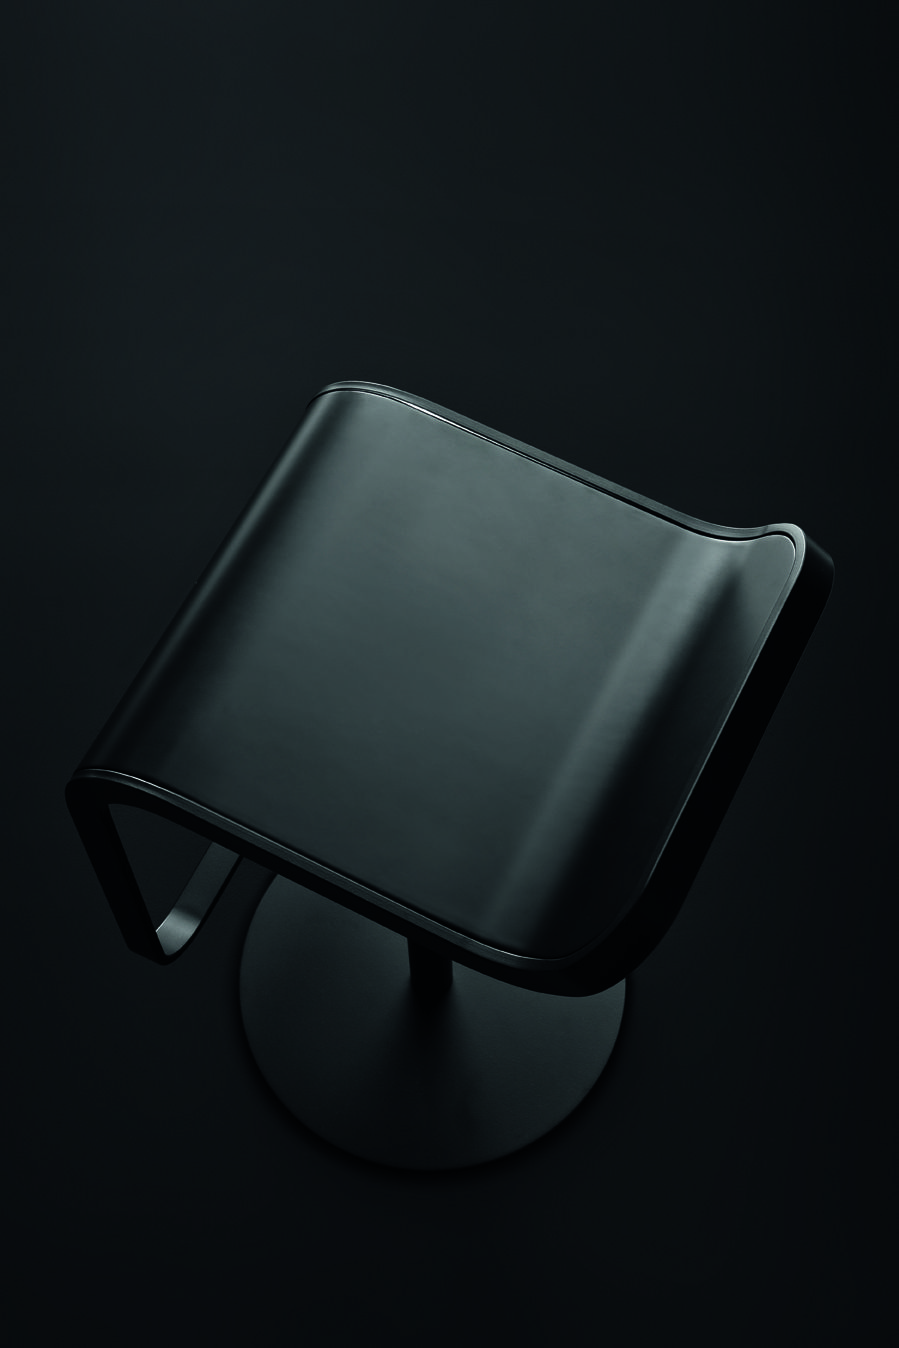 Lem Fenix Ntm 174 Stool By Lapalma Fenix Furniture Design